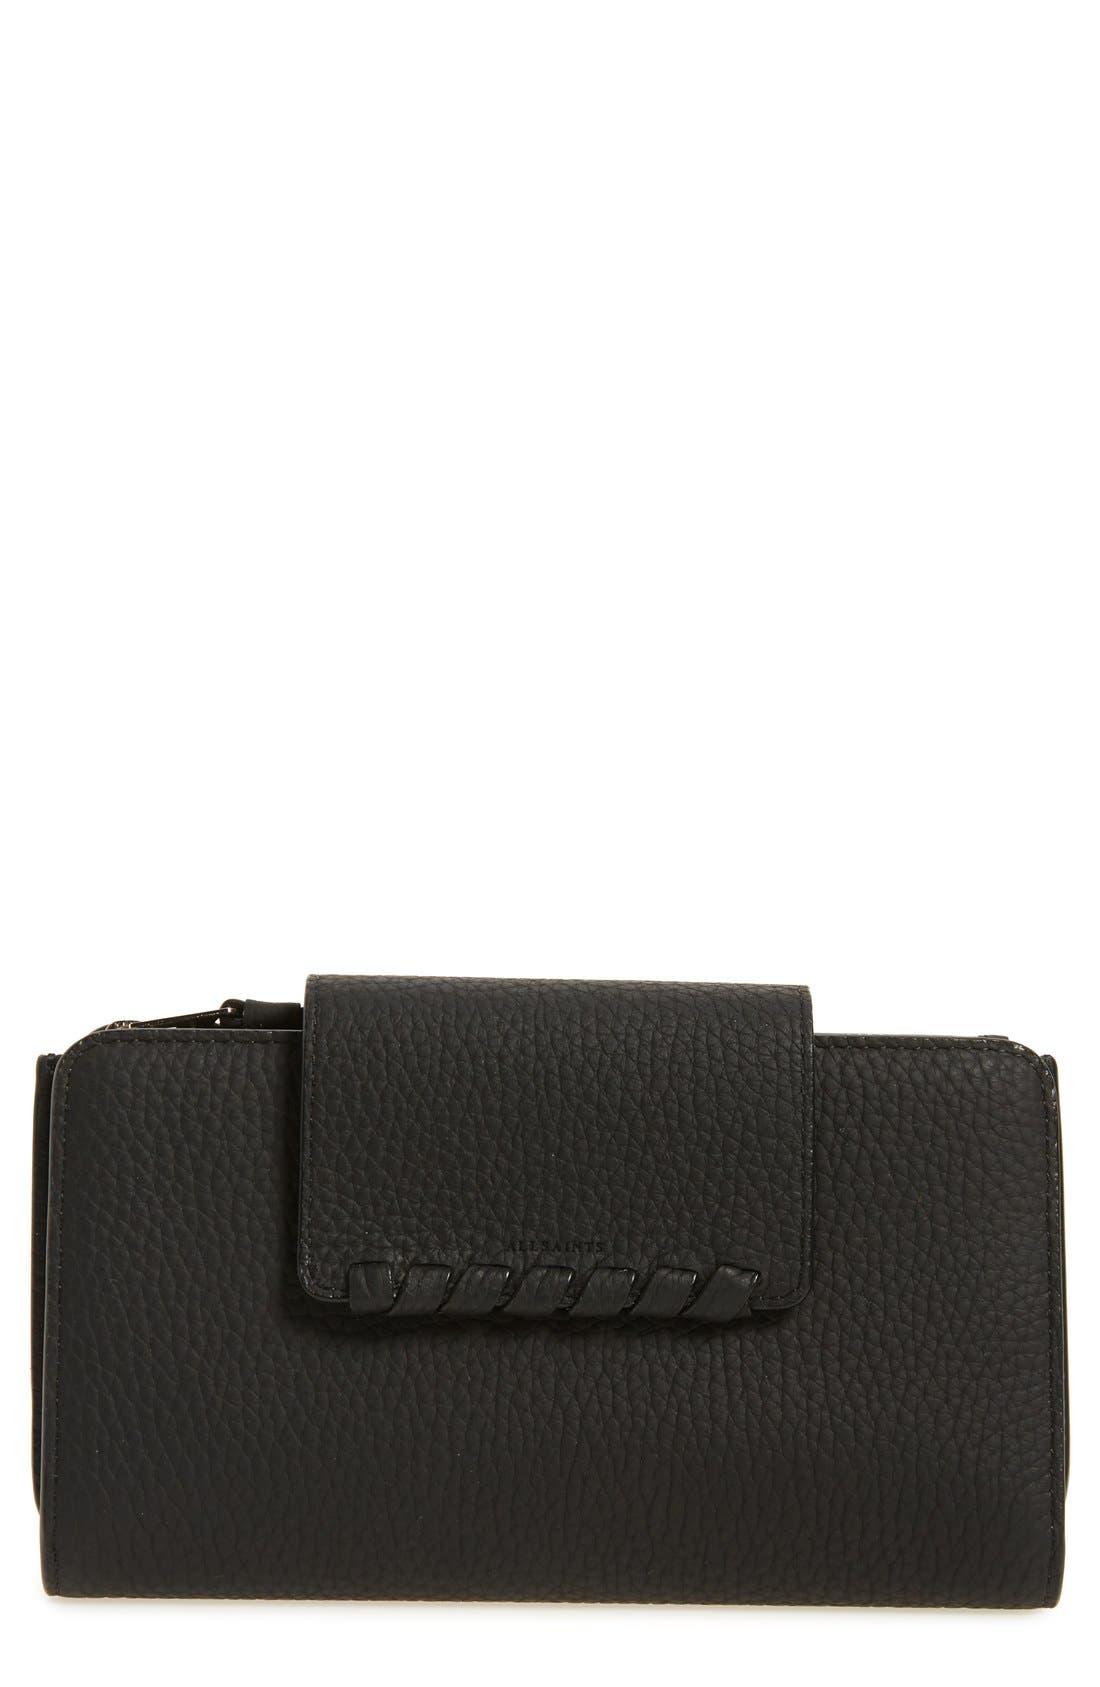 Allsaints Kita Japanese Leather Wallet Nordstrom